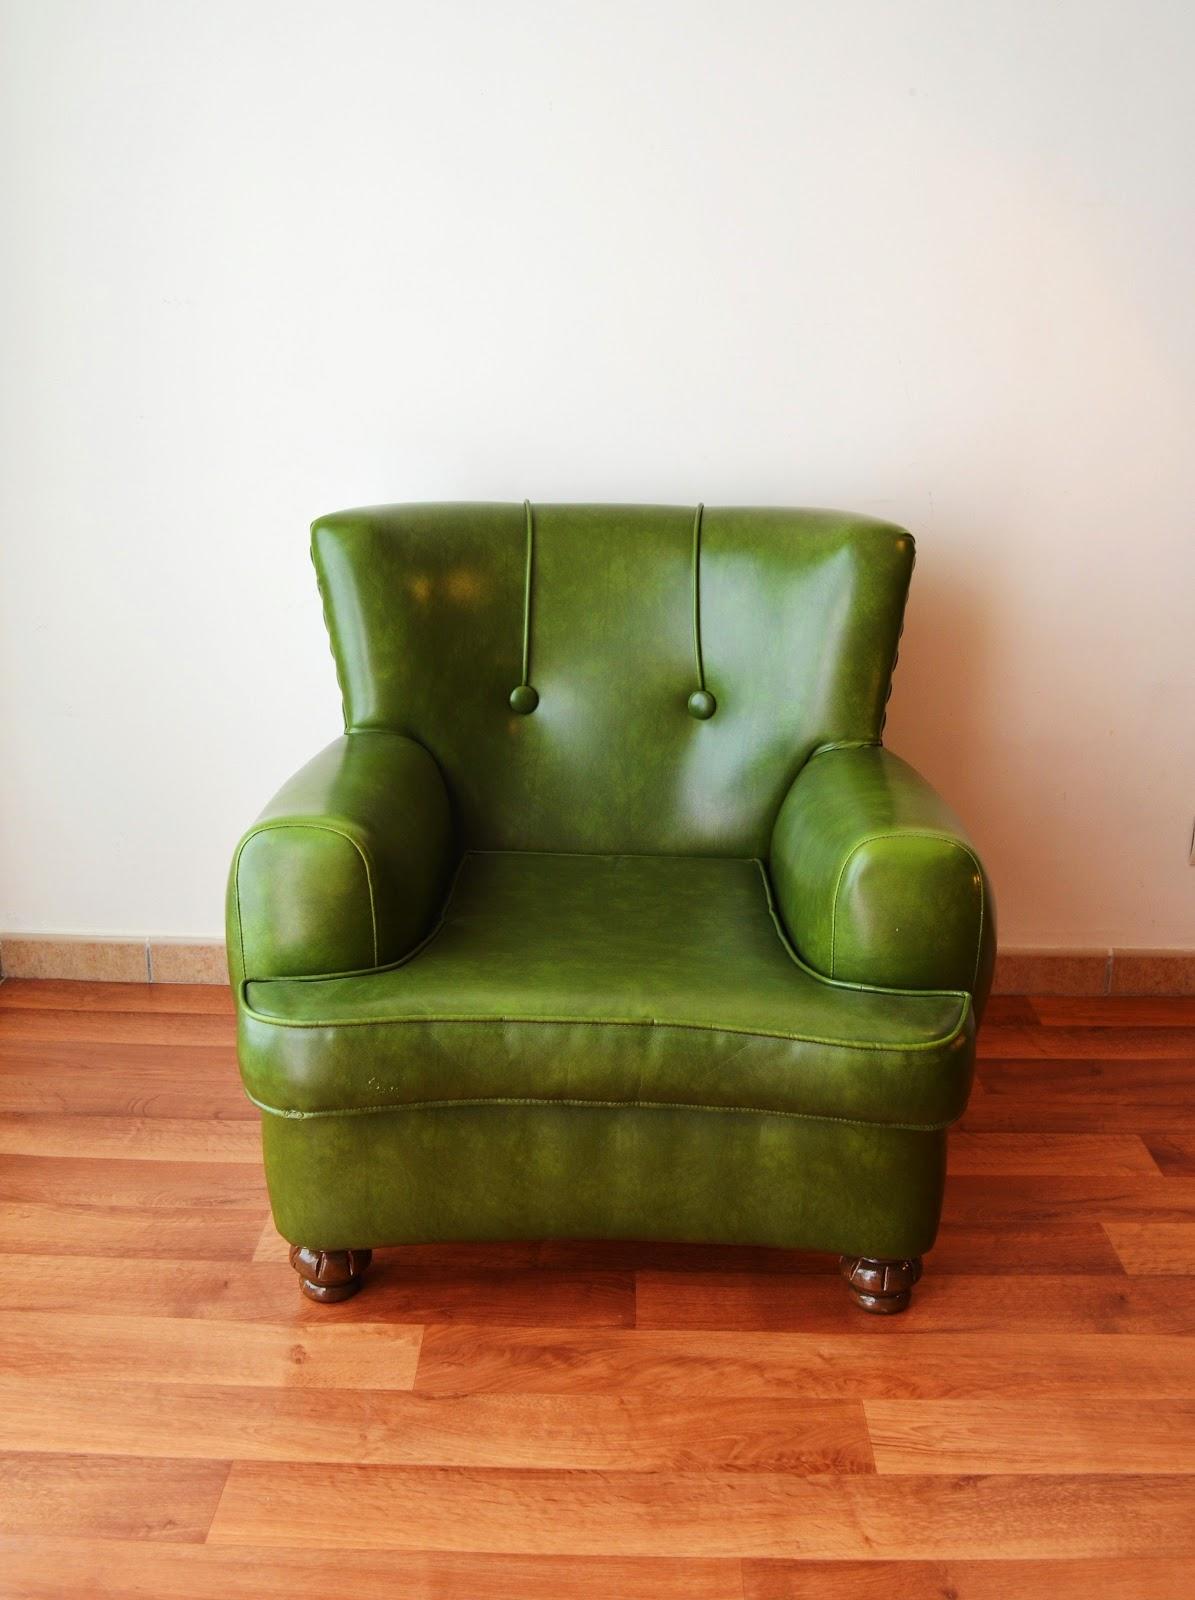 Sillones de sky polipiel verde a os 60 vendido - Sillones vintage retro ...